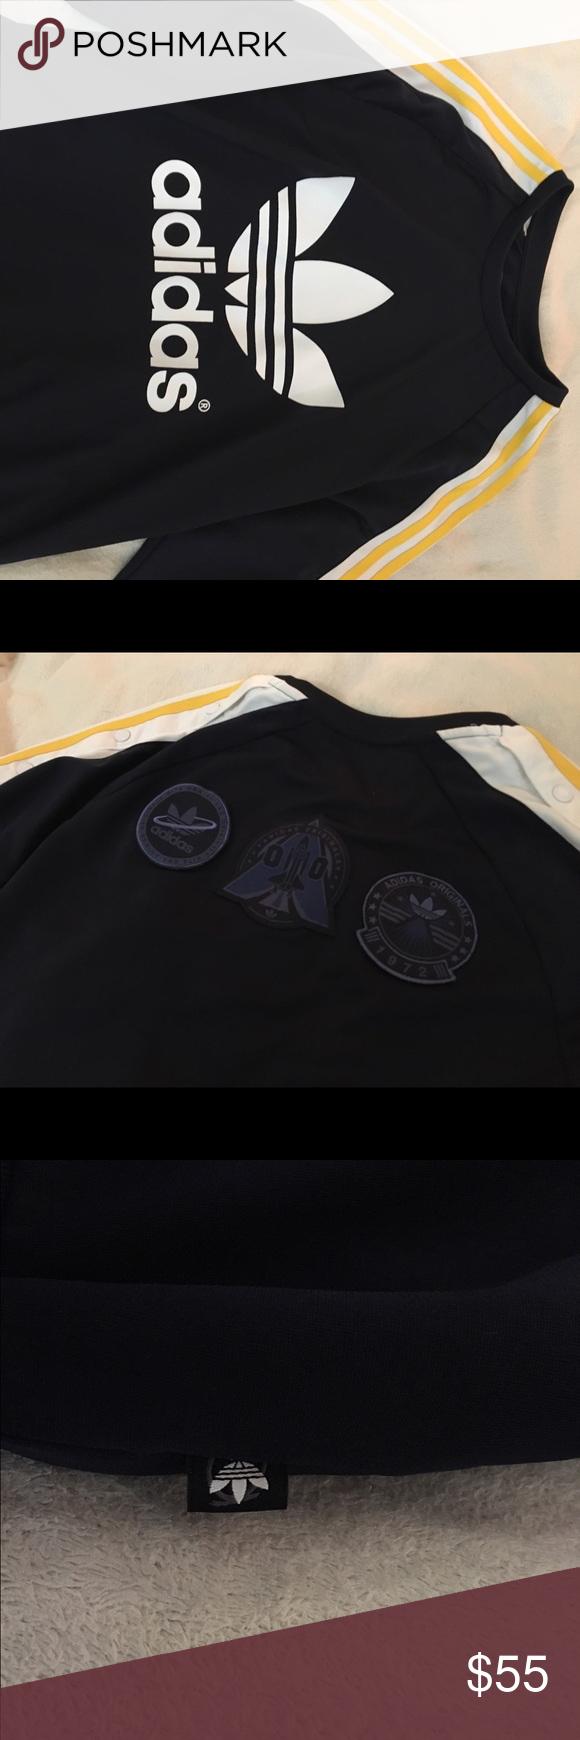 Adidas Crewneck Rita Ora Adidas x Collab. Three yellow stripes on the sleeve. Sold out everywhere Adidas Sweaters